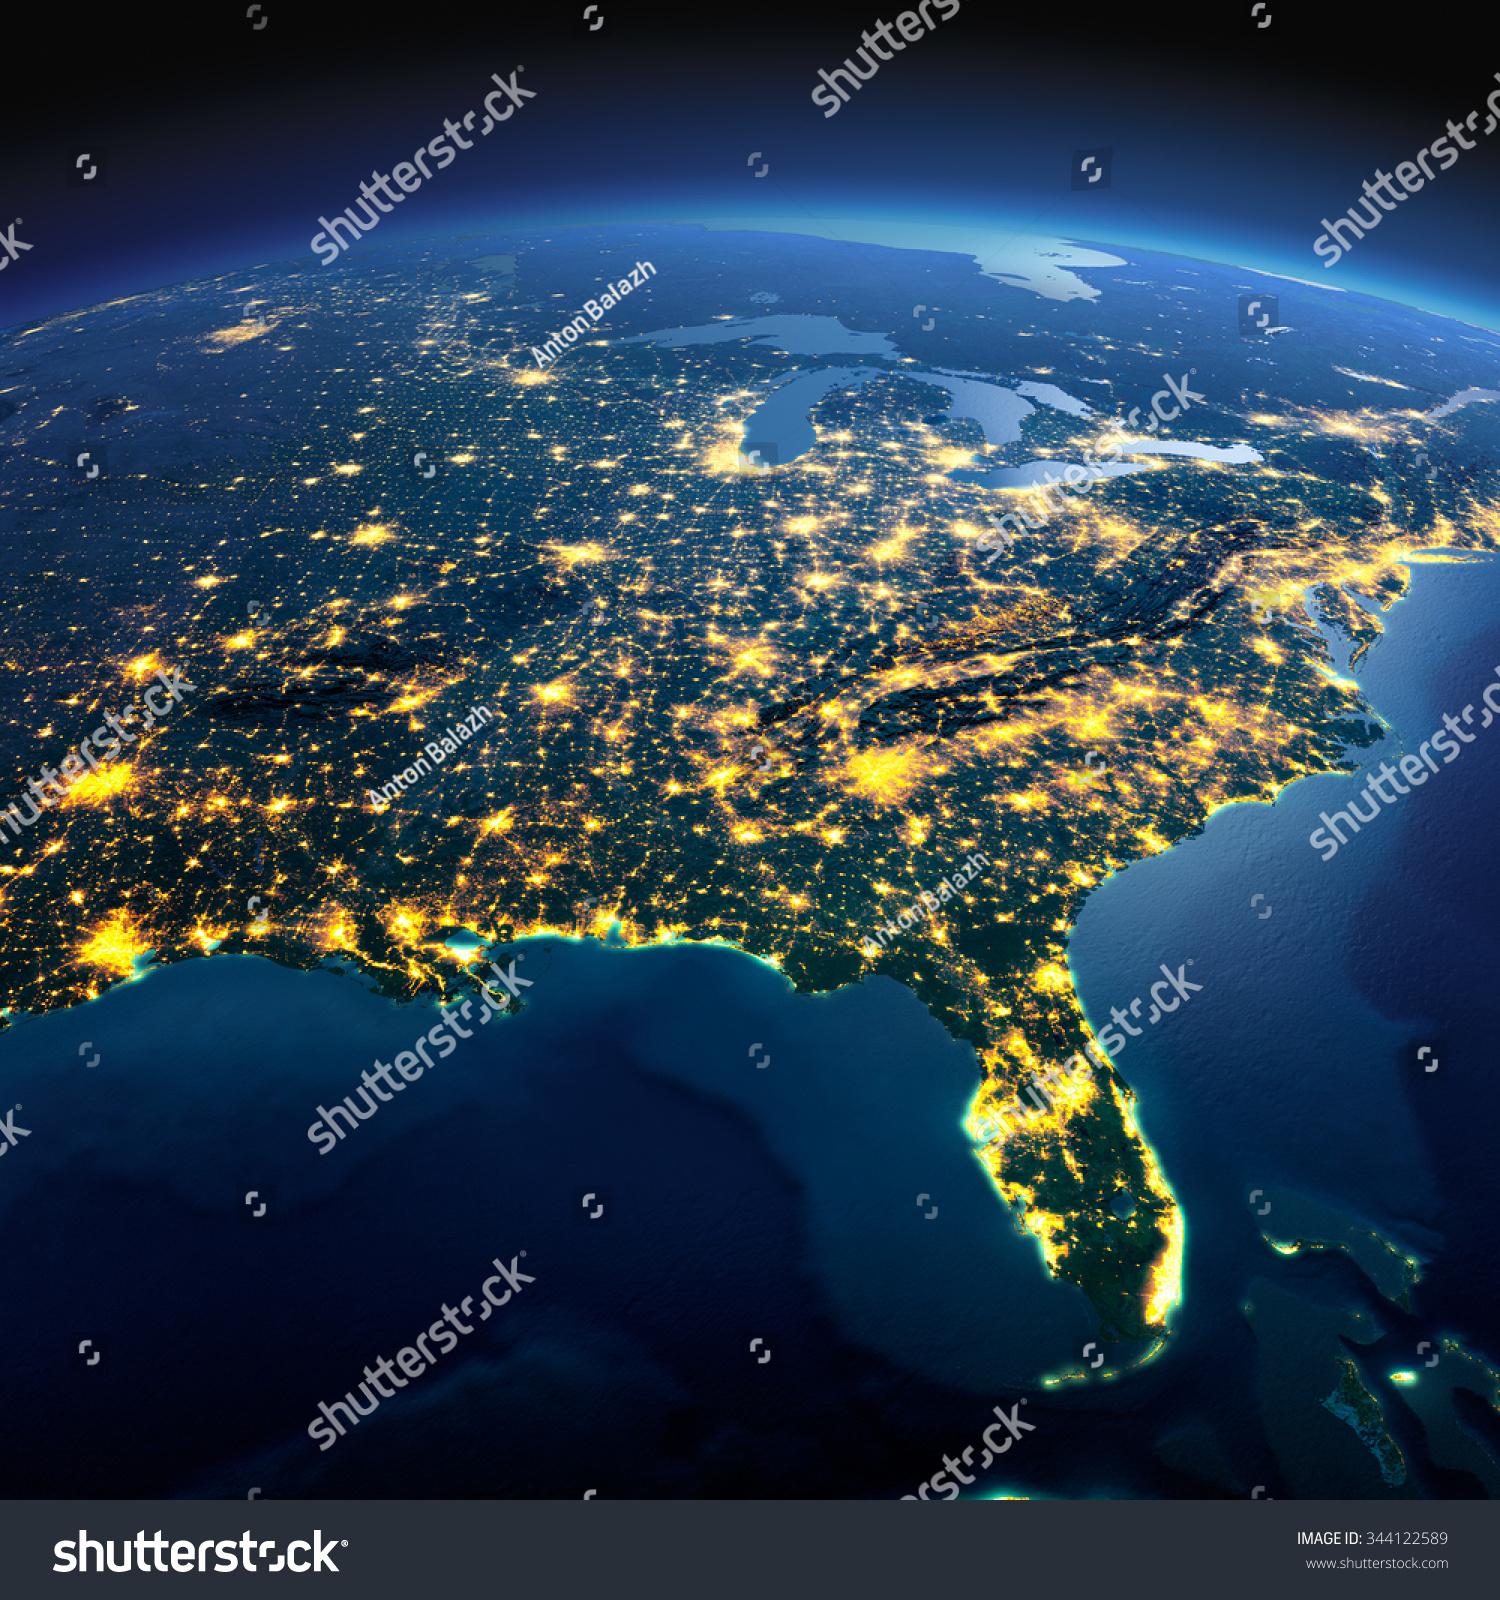 night light footprint north america nasa - photo #34